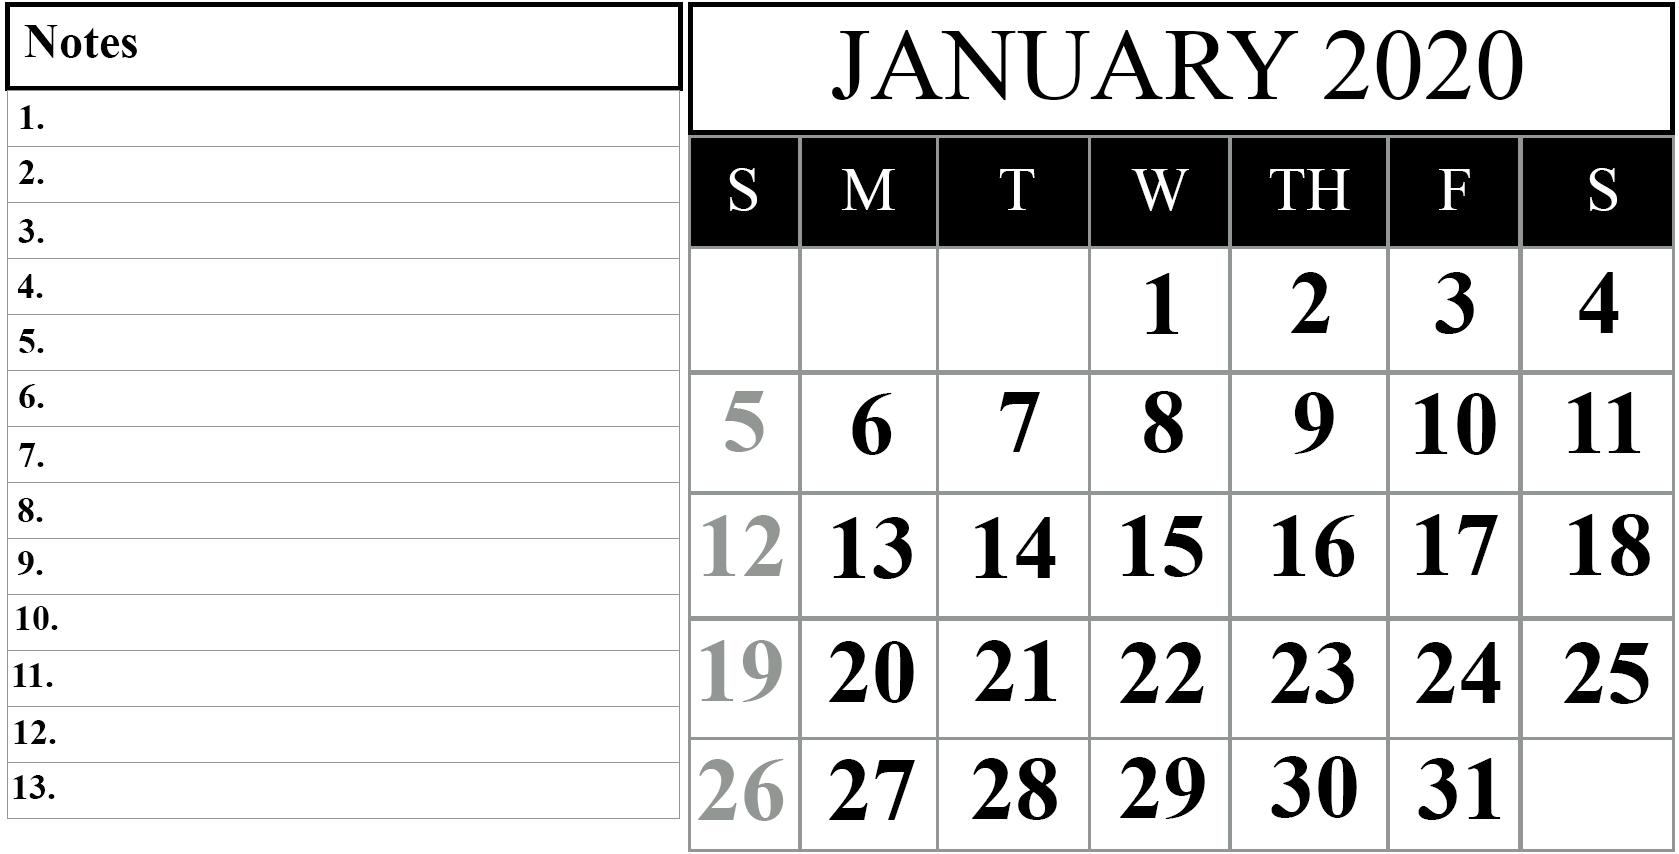 January 2020 Calendar With Notes #january #january2020